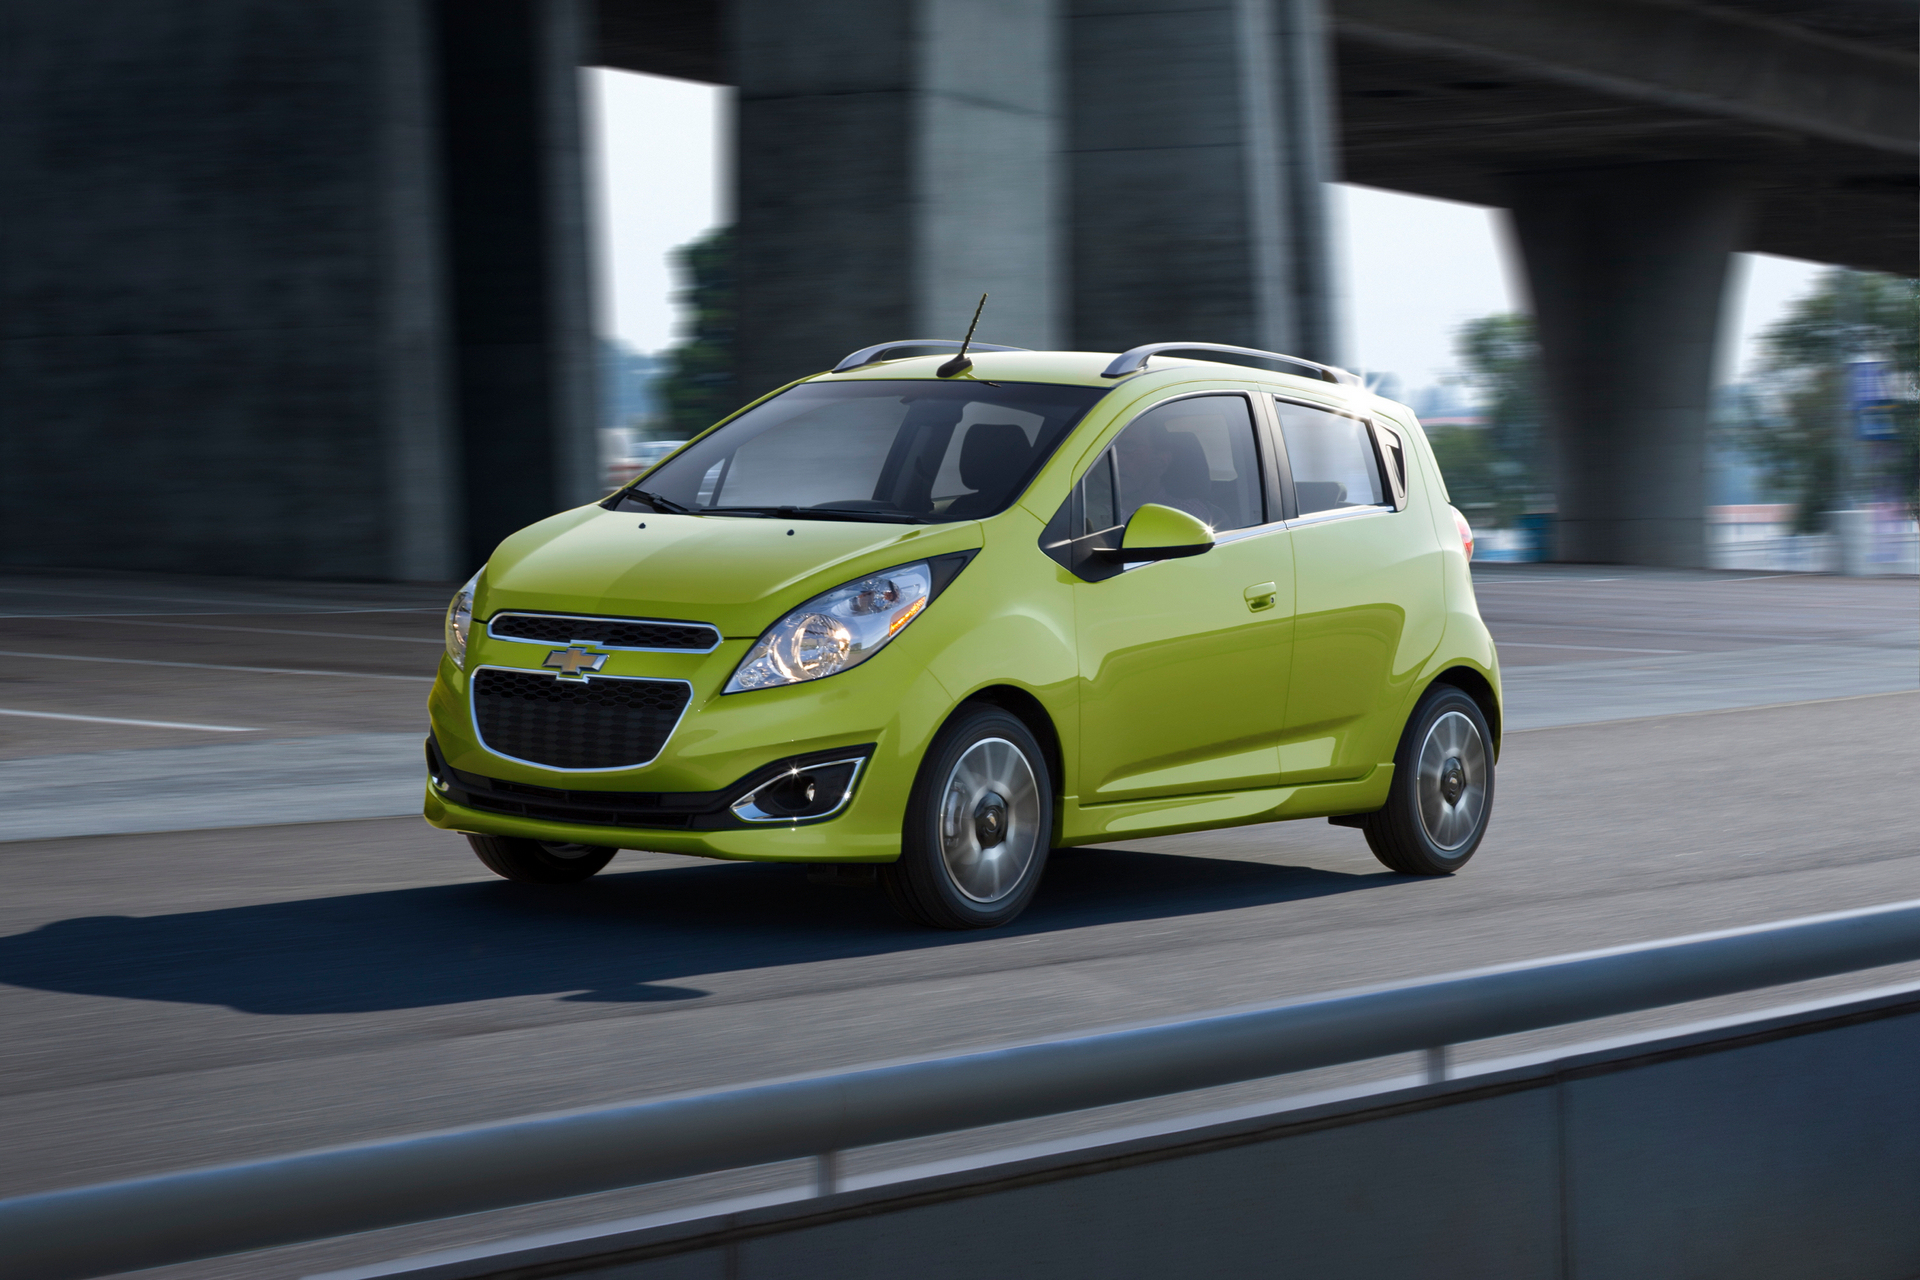 2015 Chevrolet Spark © General Motors